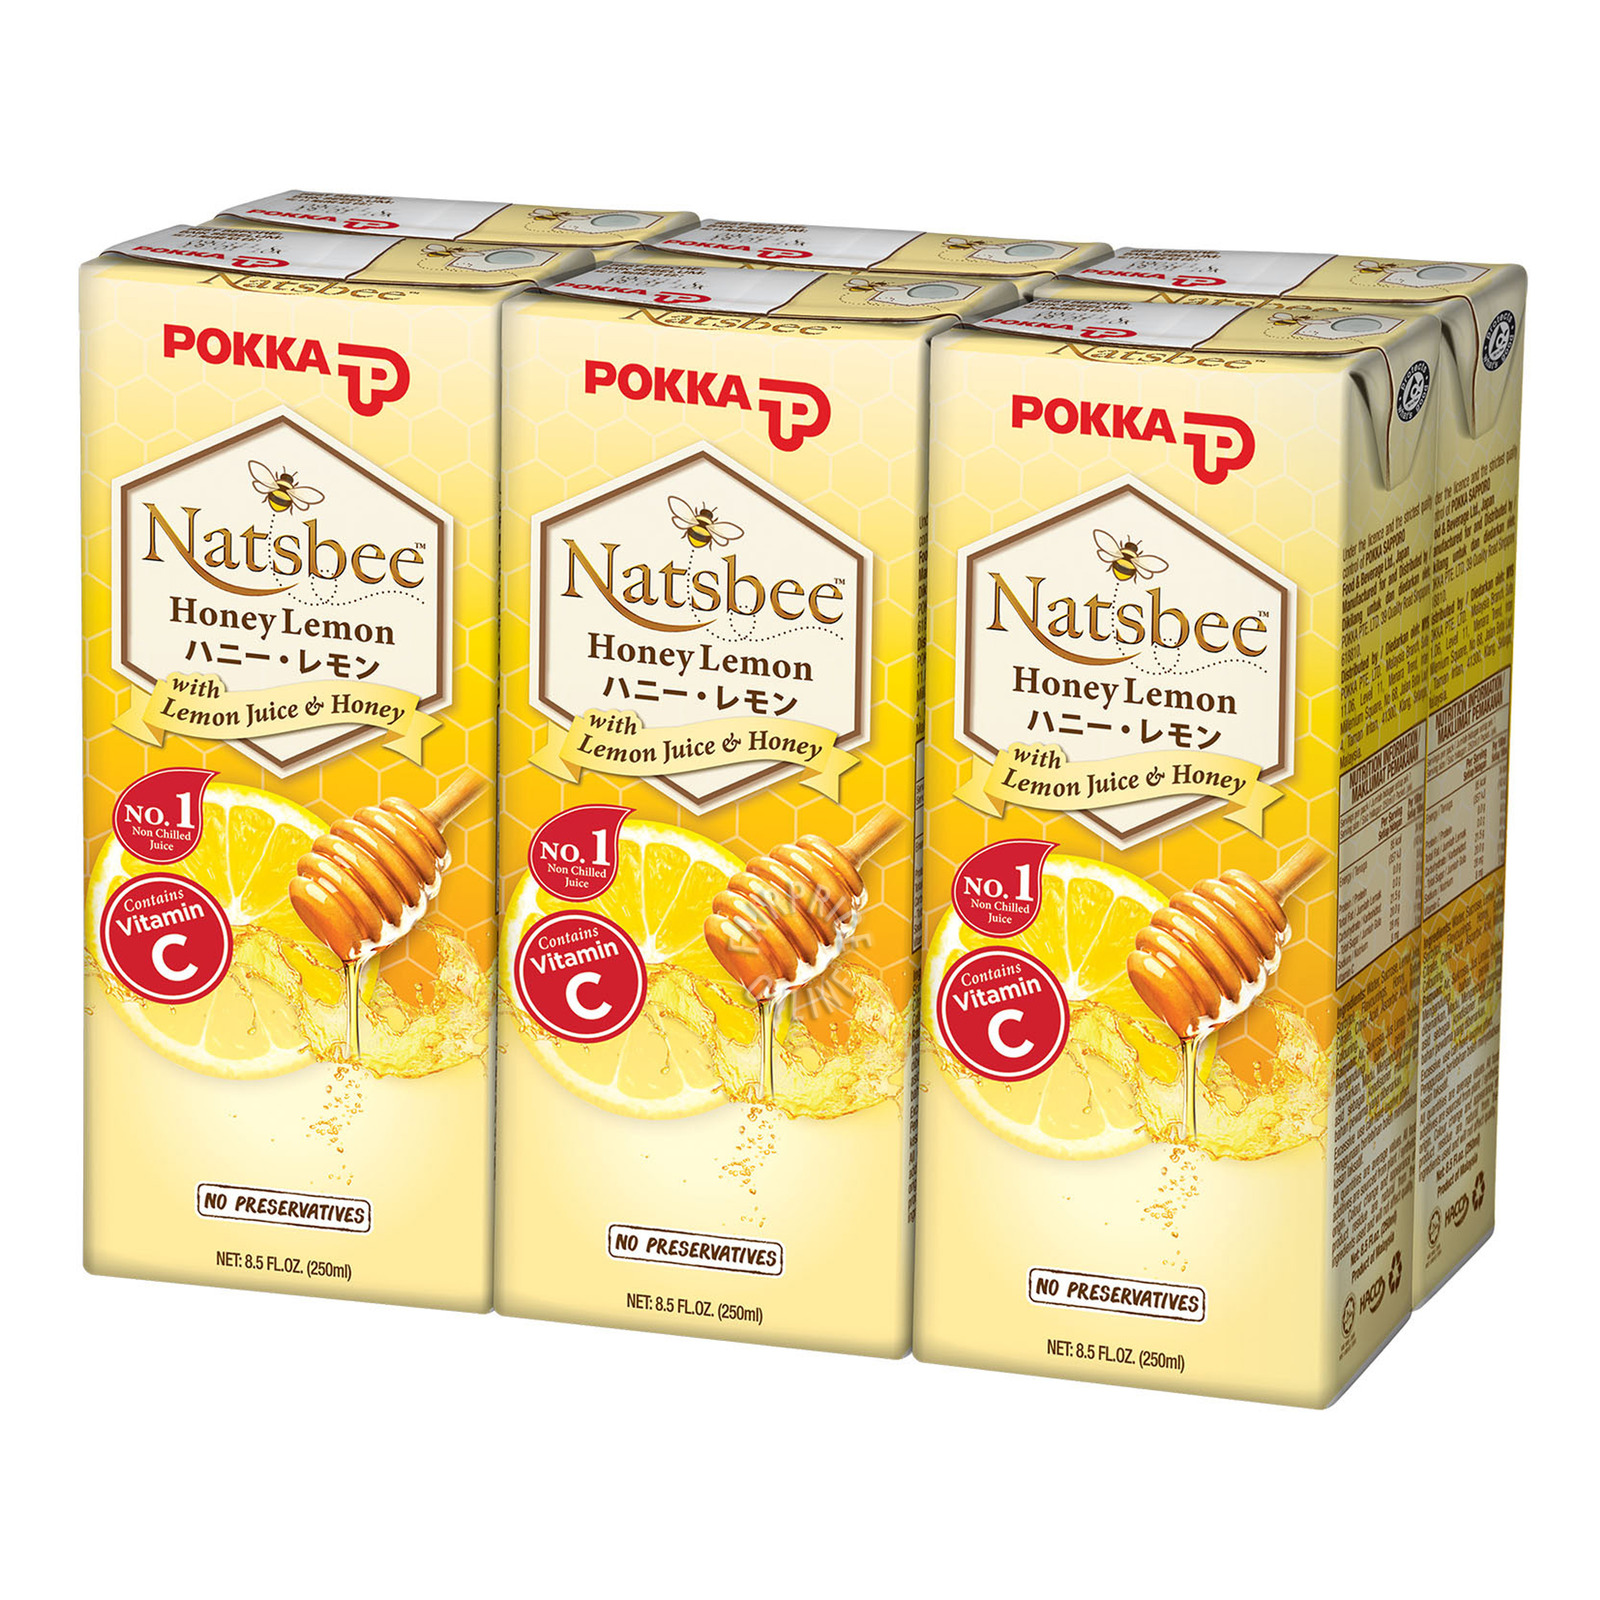 Pokka Packet Drink - Natsubee Honey Lemon